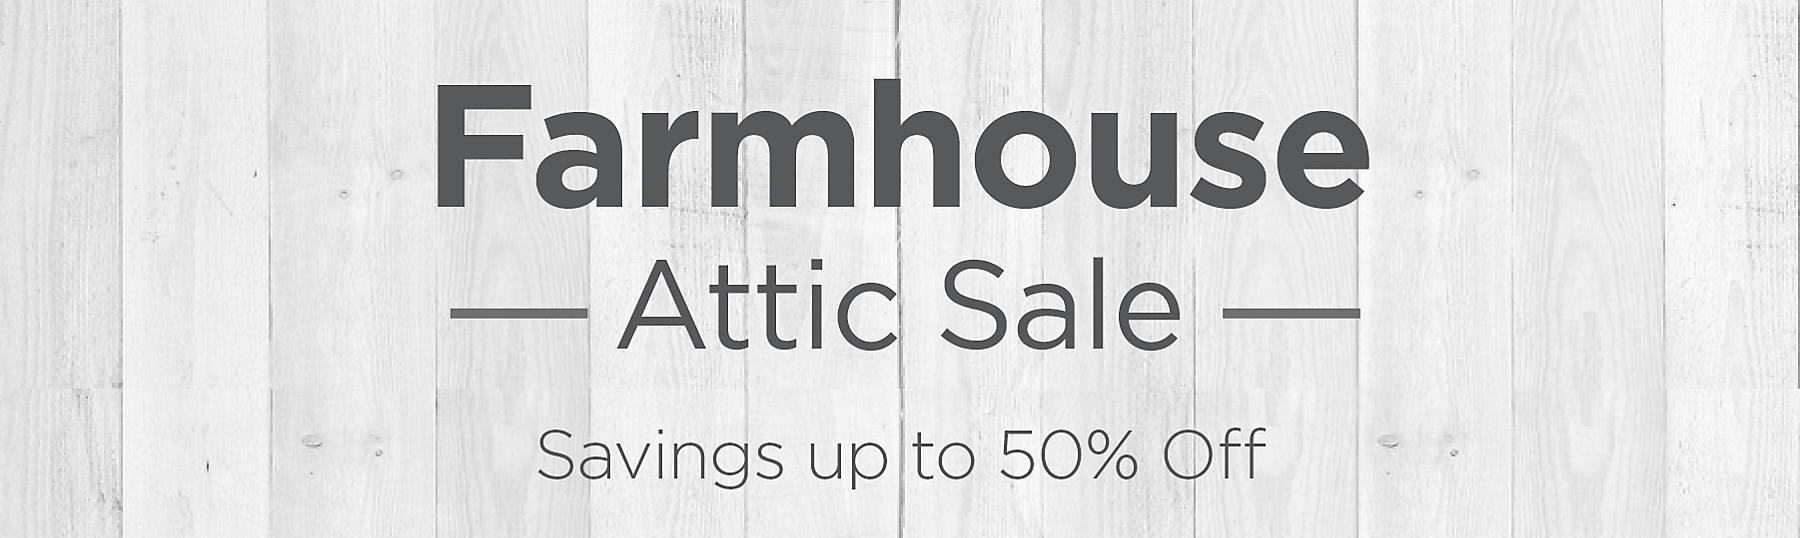 Farmhouse Attic Sale Savings Up to 50% OFF